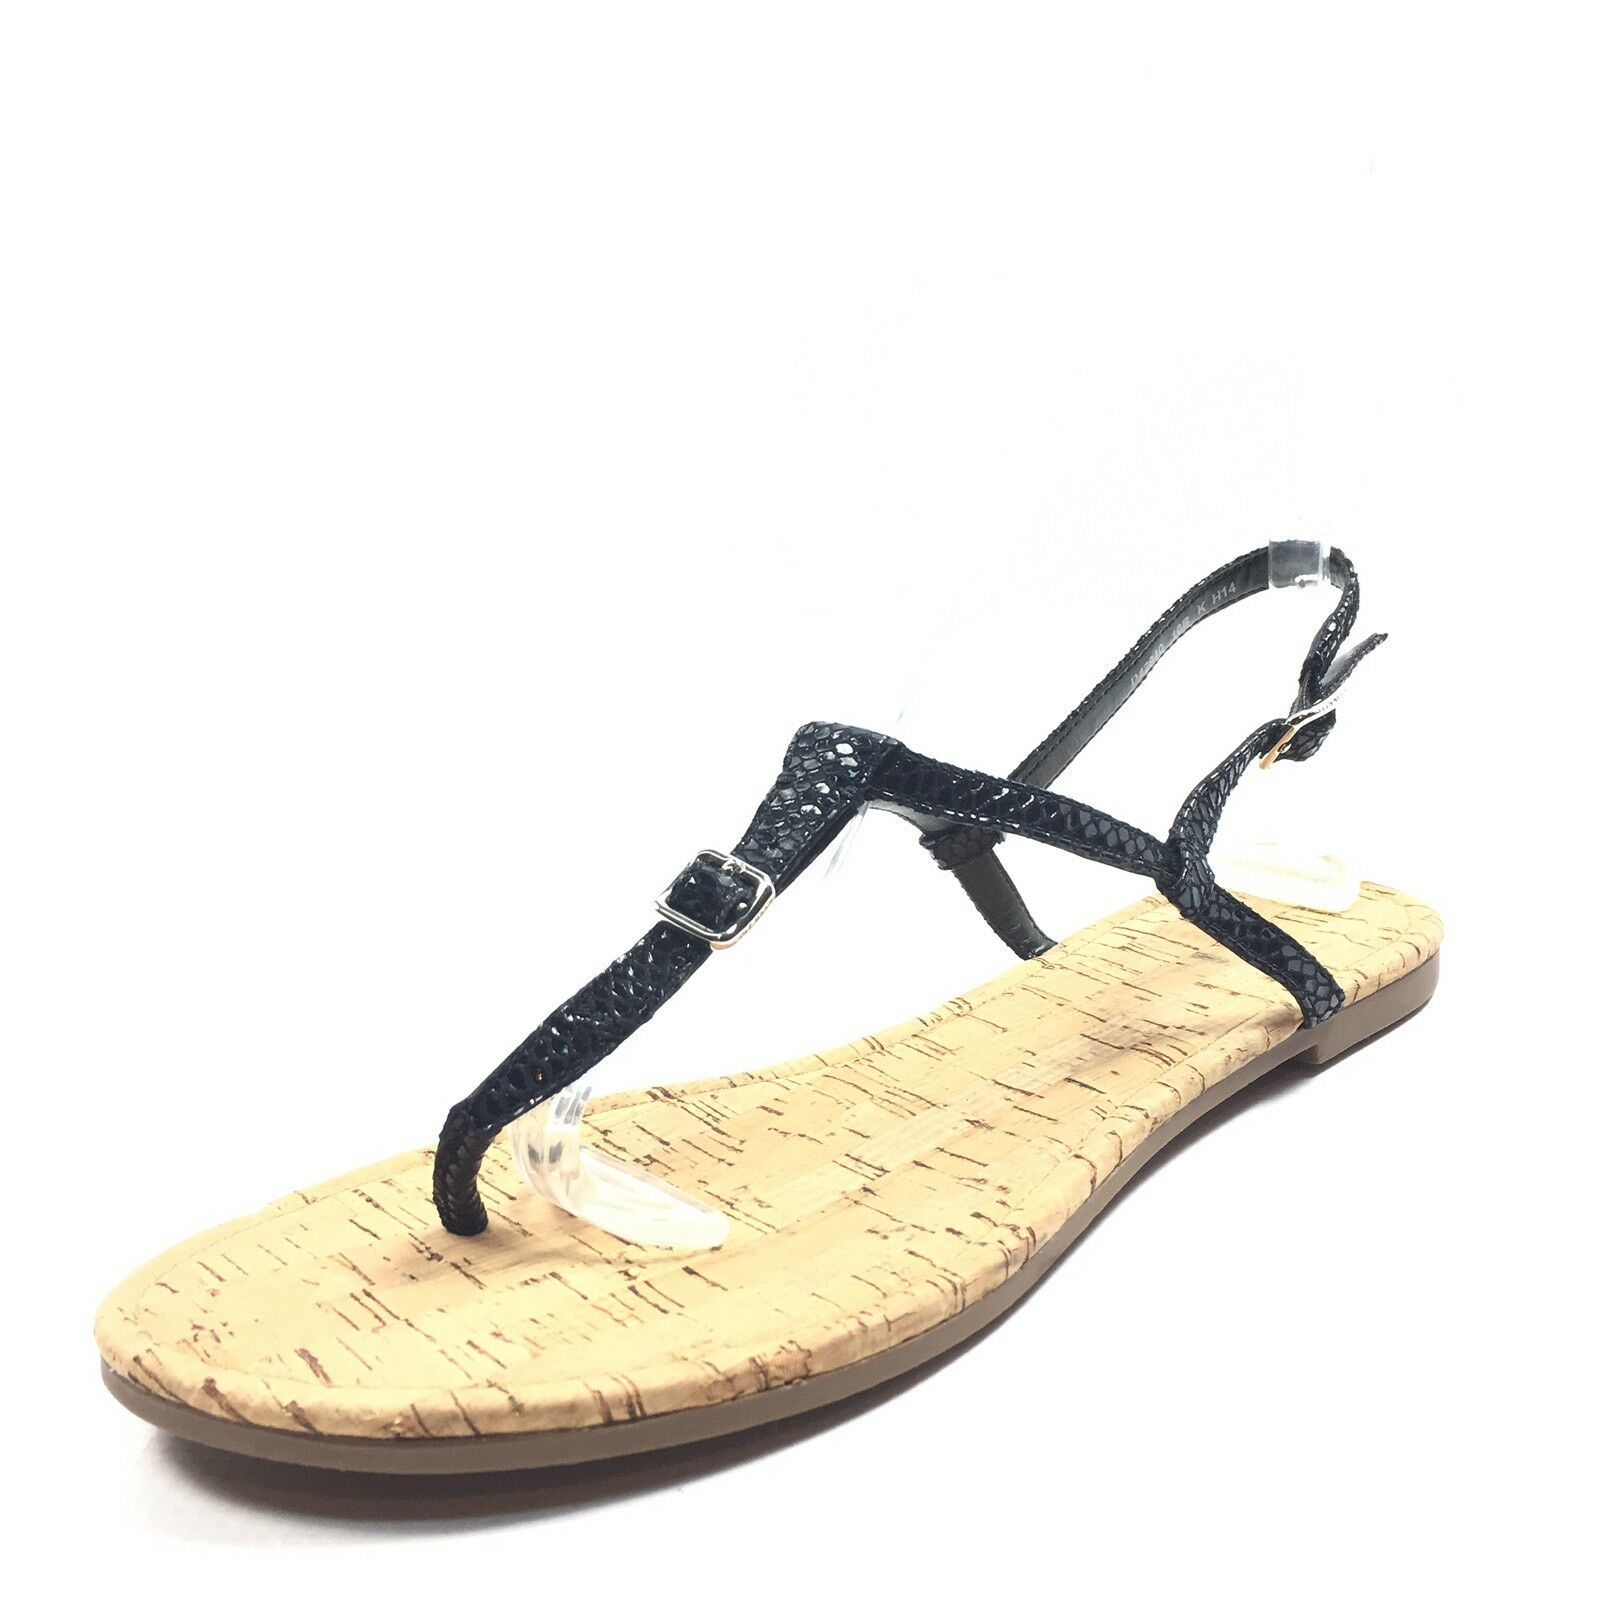 New $128 Cole Haan Britt Black Leather Thong Sandals Women's Size 10 M*